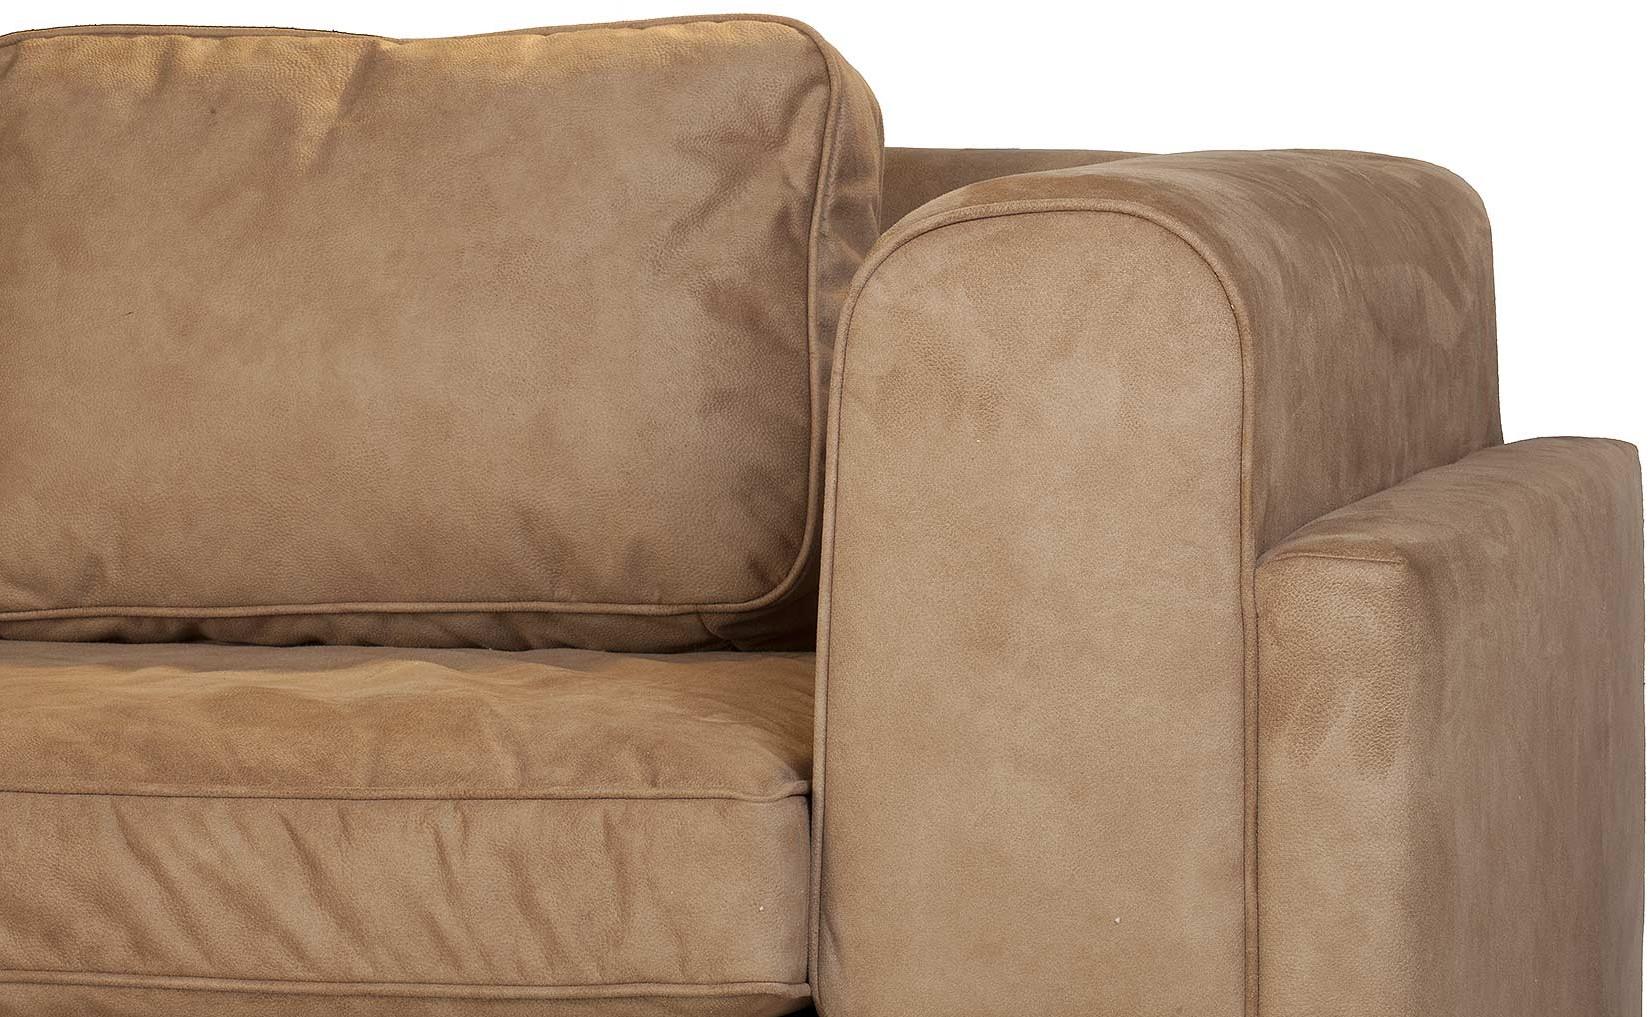 Sofa Alexandria Eco Leather Like Camel